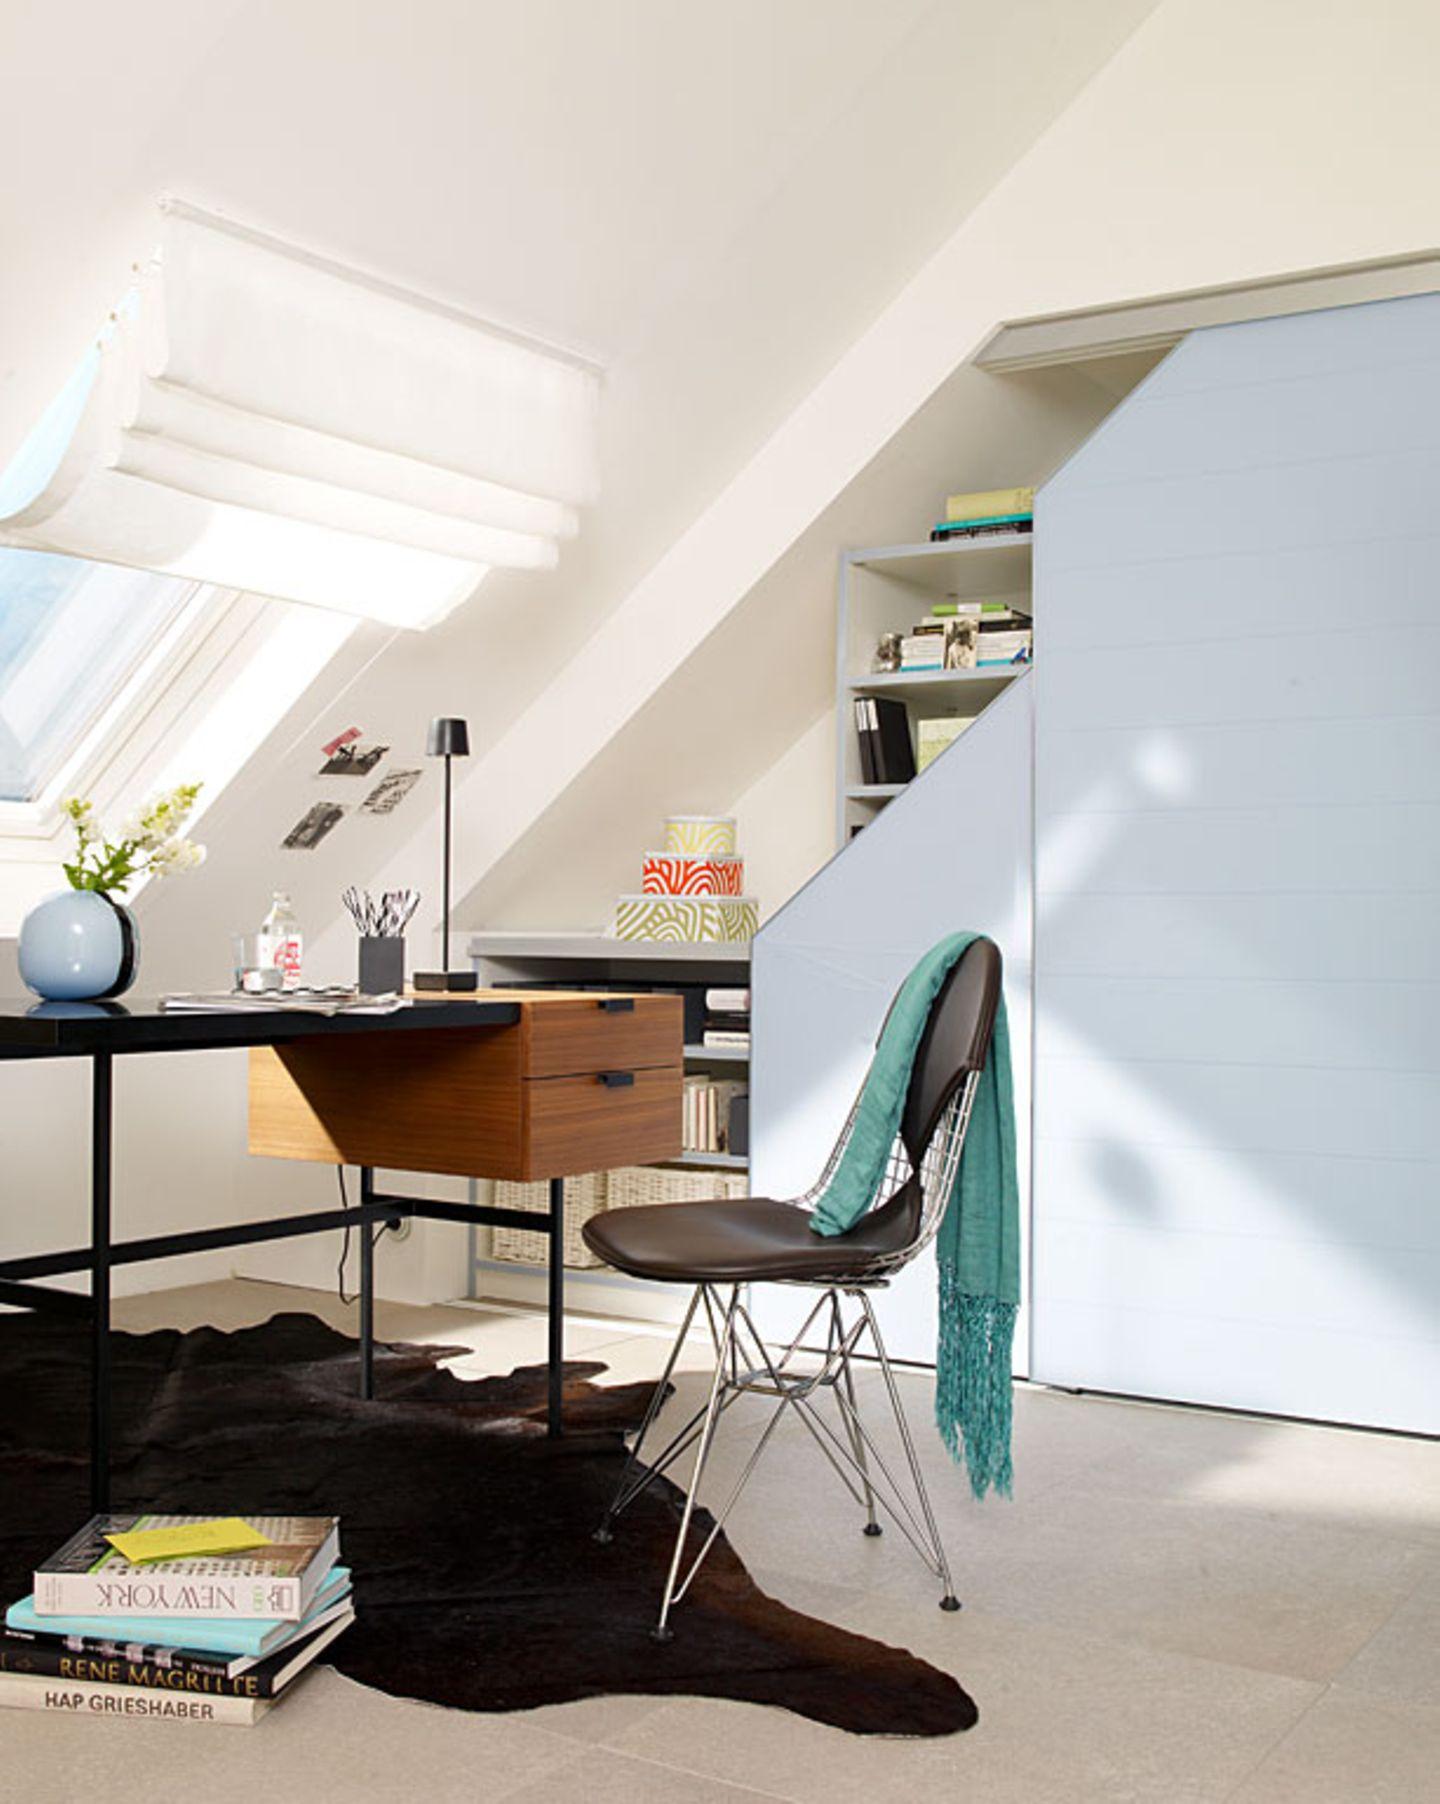 Filigrane Möbel vergrößern den Raum